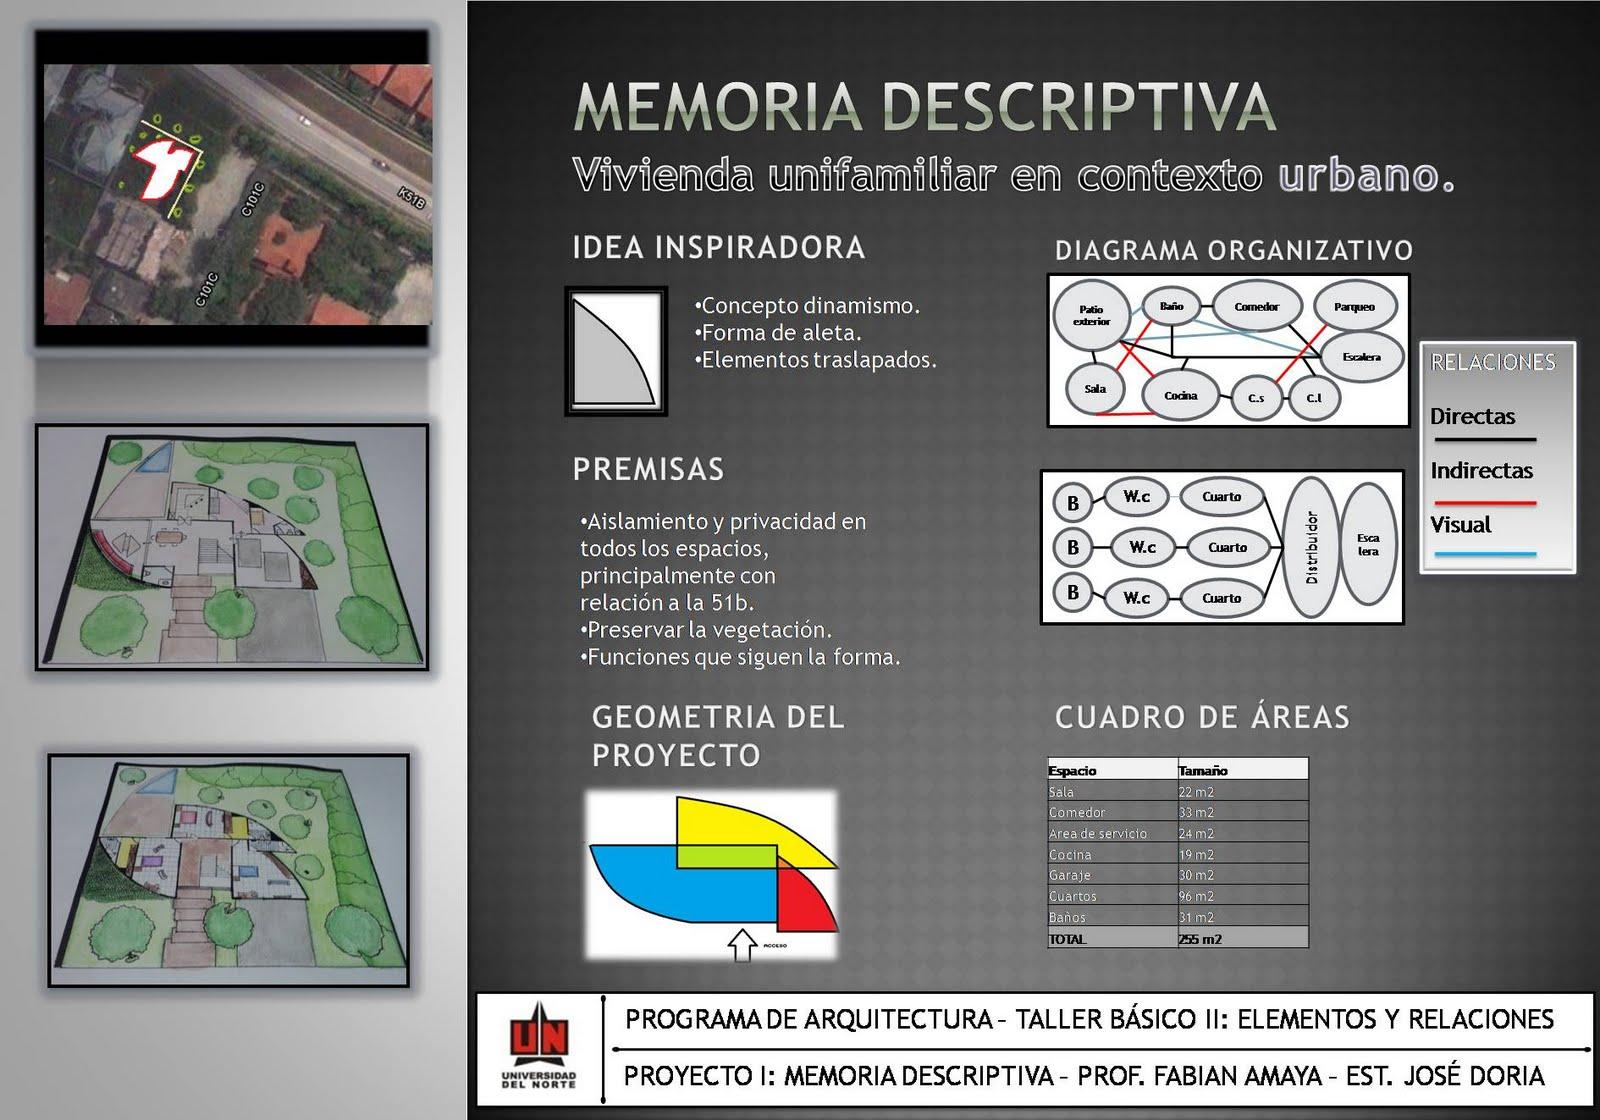 Jos doria trabajos taller basico for Memoria descriptiva arquitectura